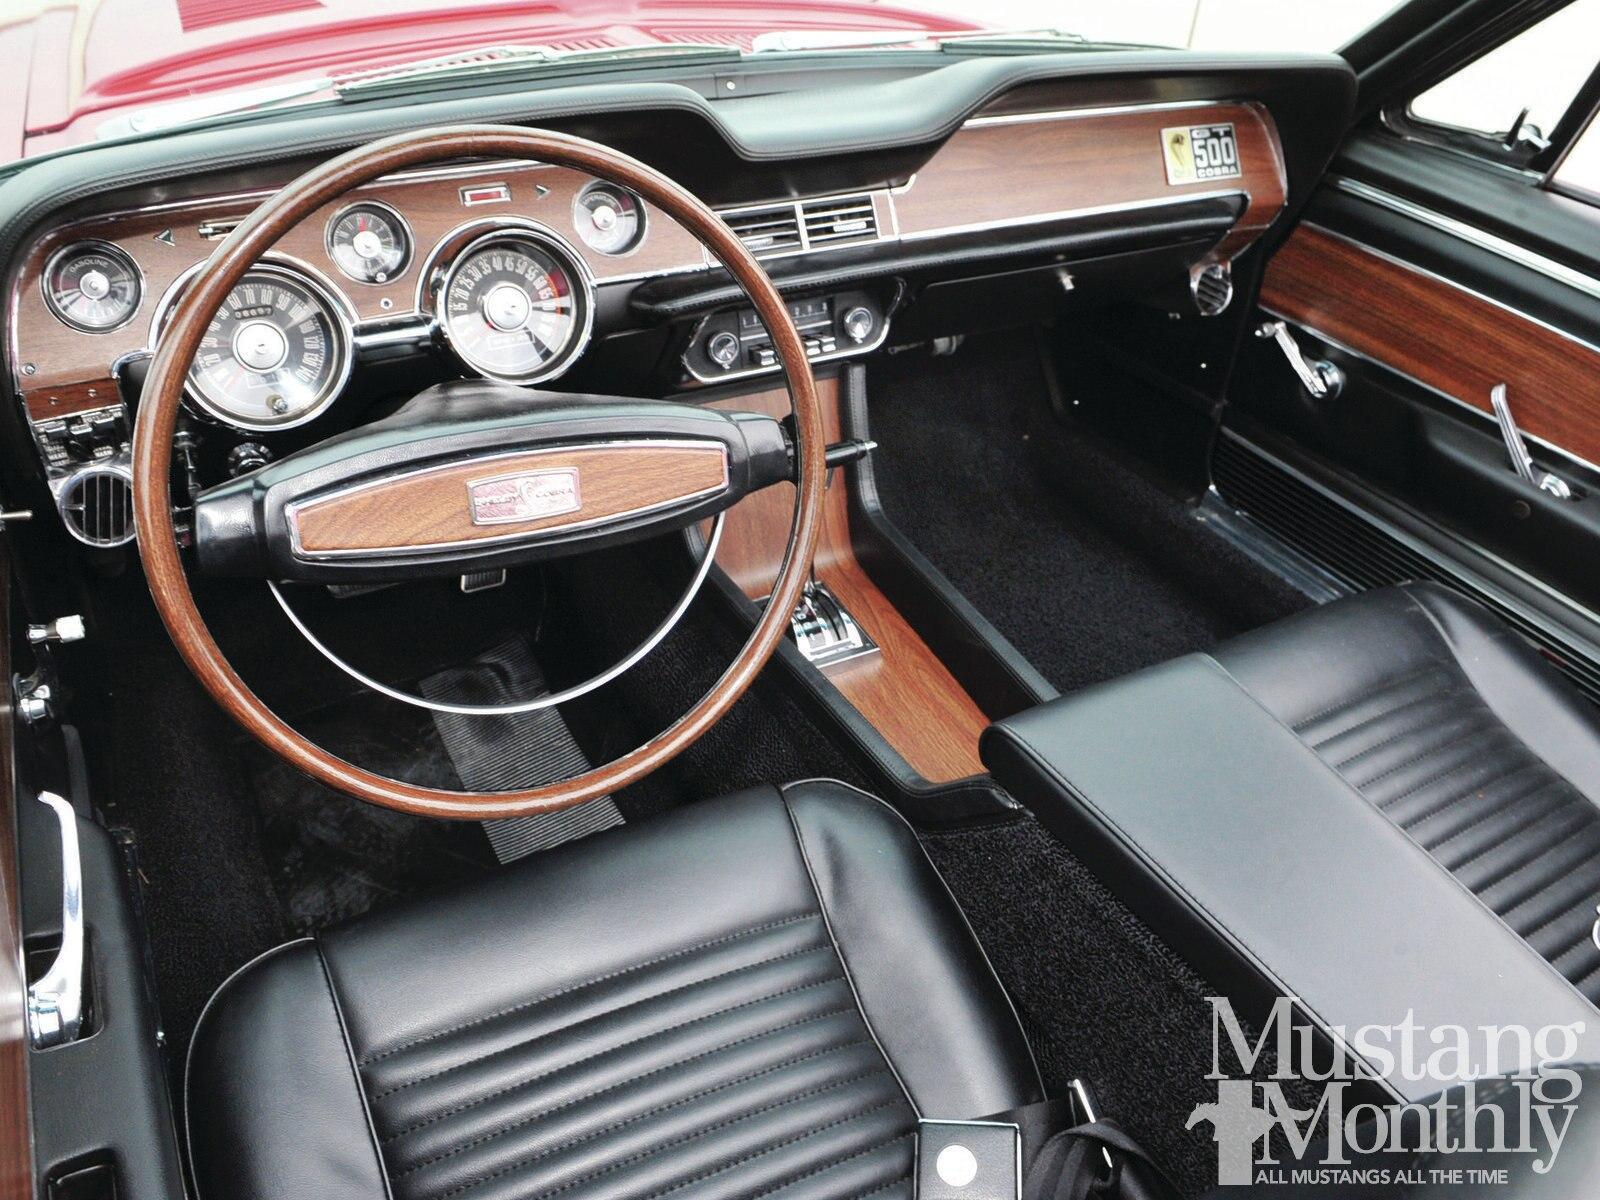 Mump 1206 003 1967 Shelby Convertible Rare Air